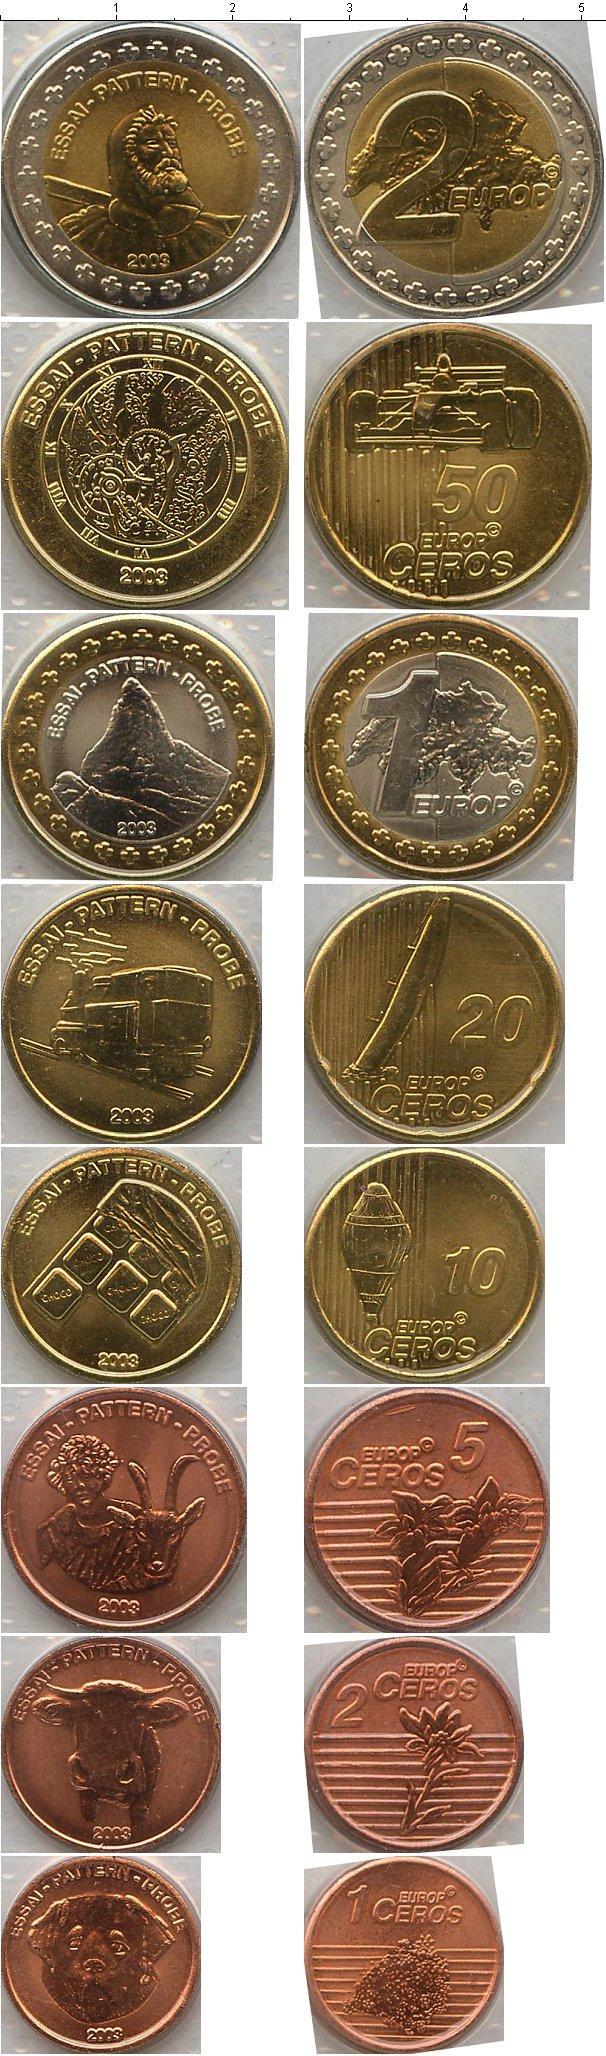 Каталог монет - Швейцария Евро-модель